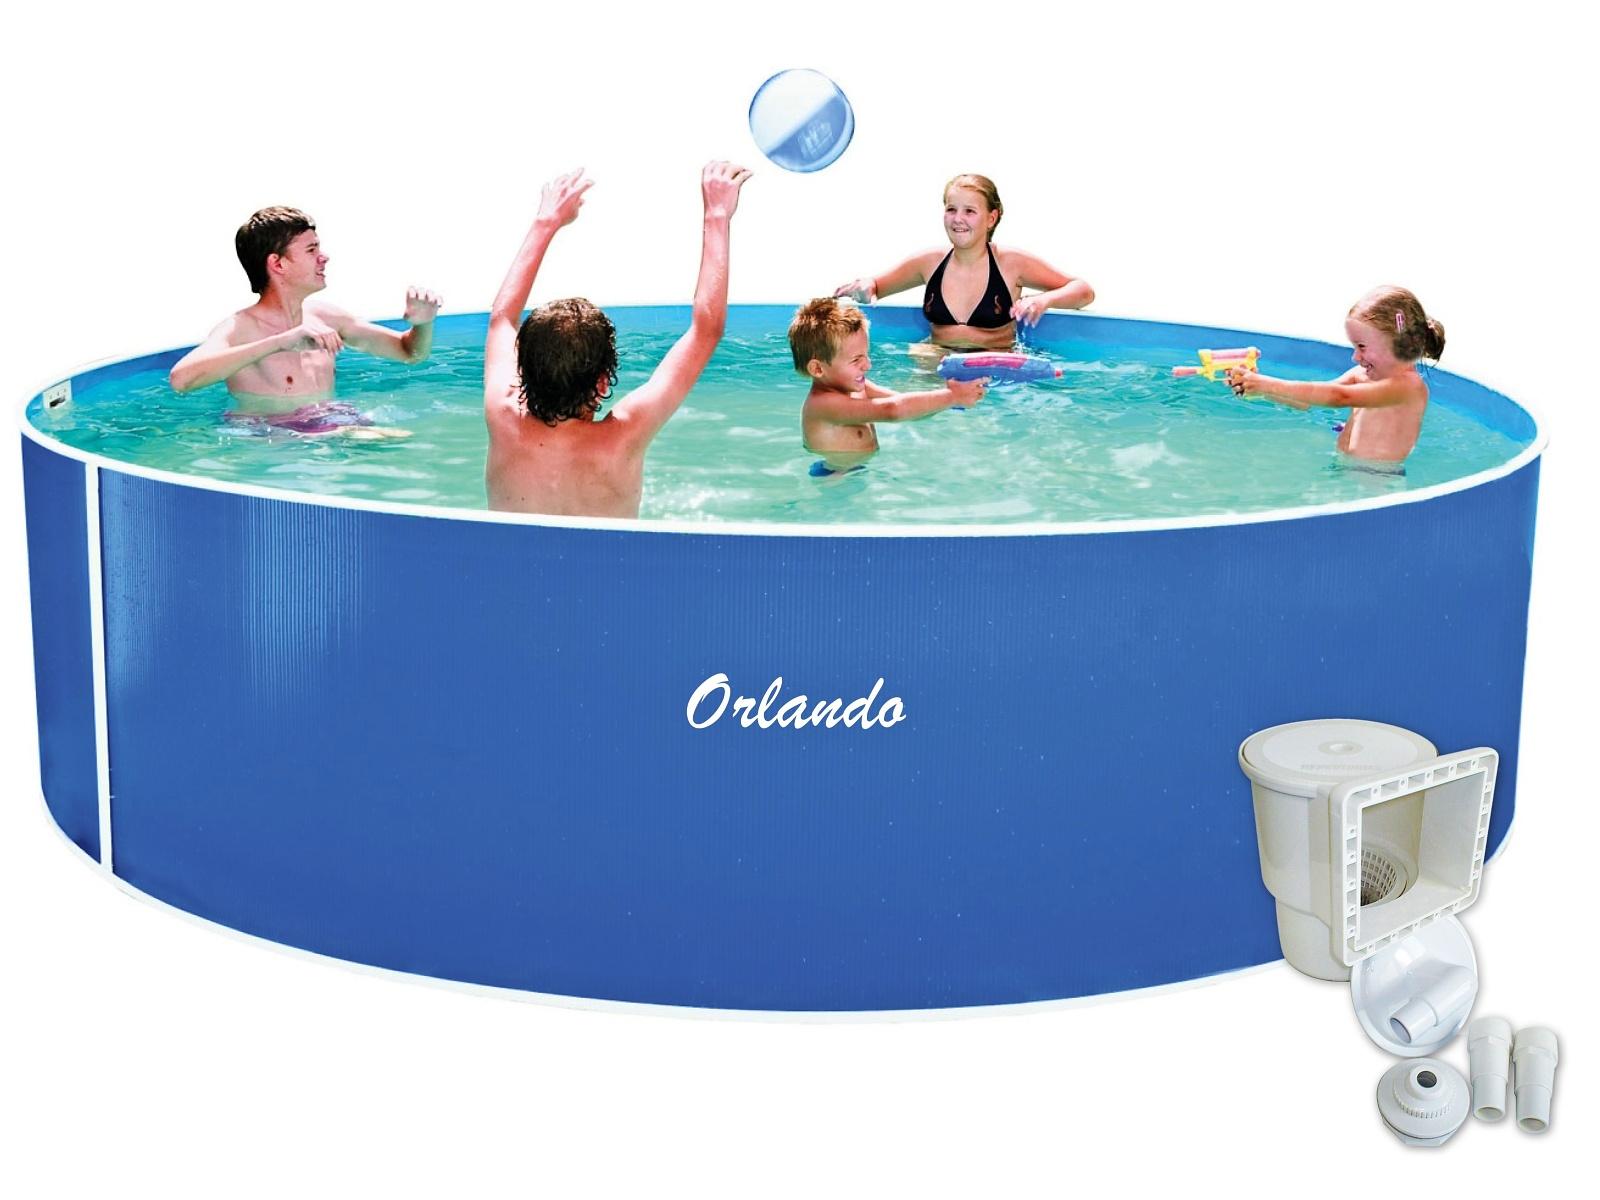 Bazén MARIMEX Orlando 457 x 107 cm + skimmer Olympic - 2.jakost